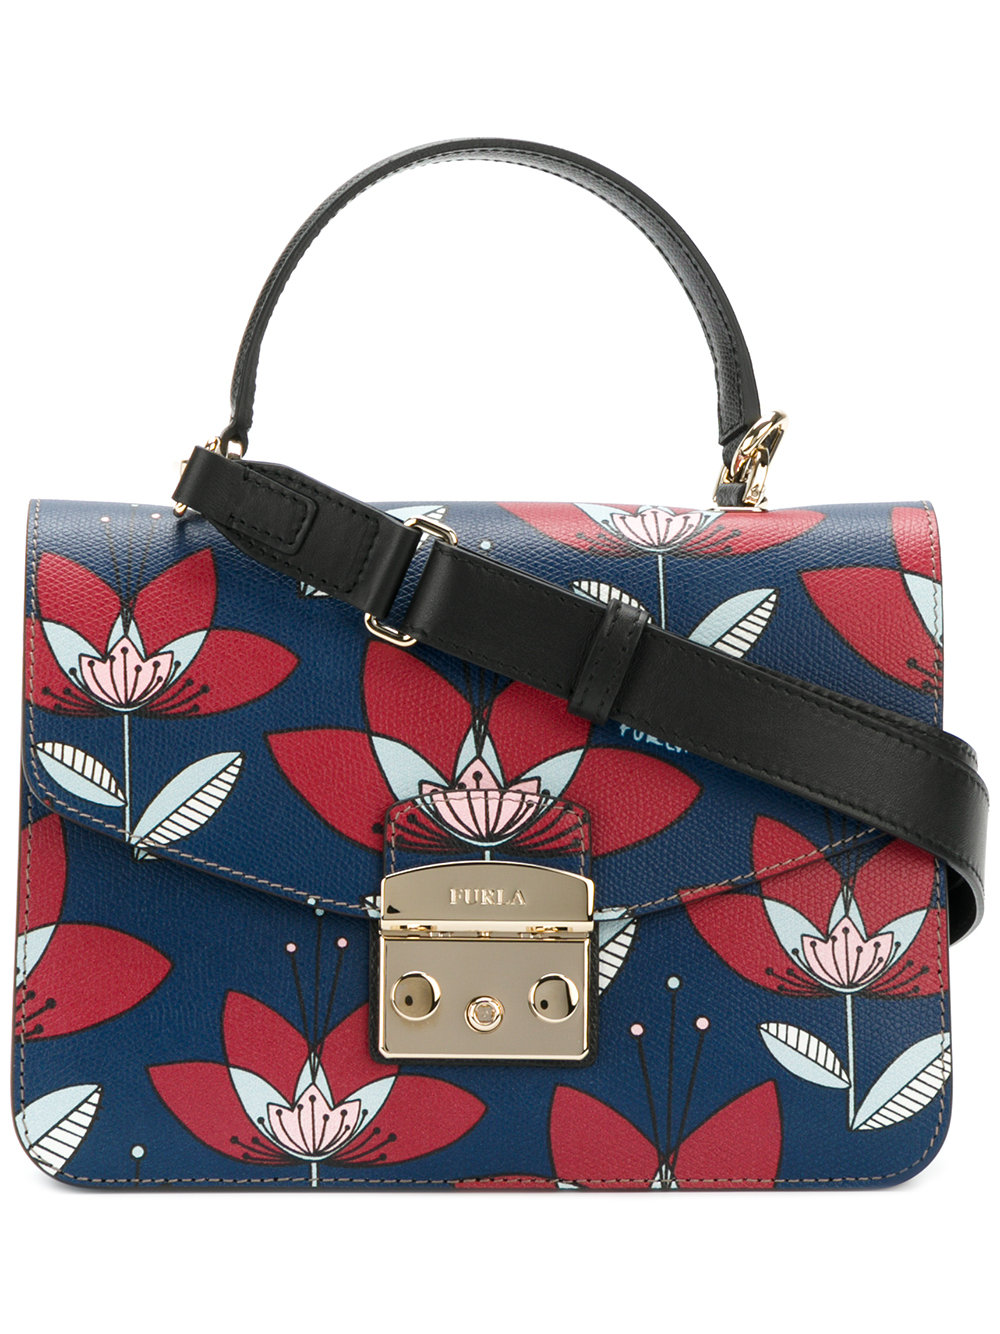 FURLA bag $399